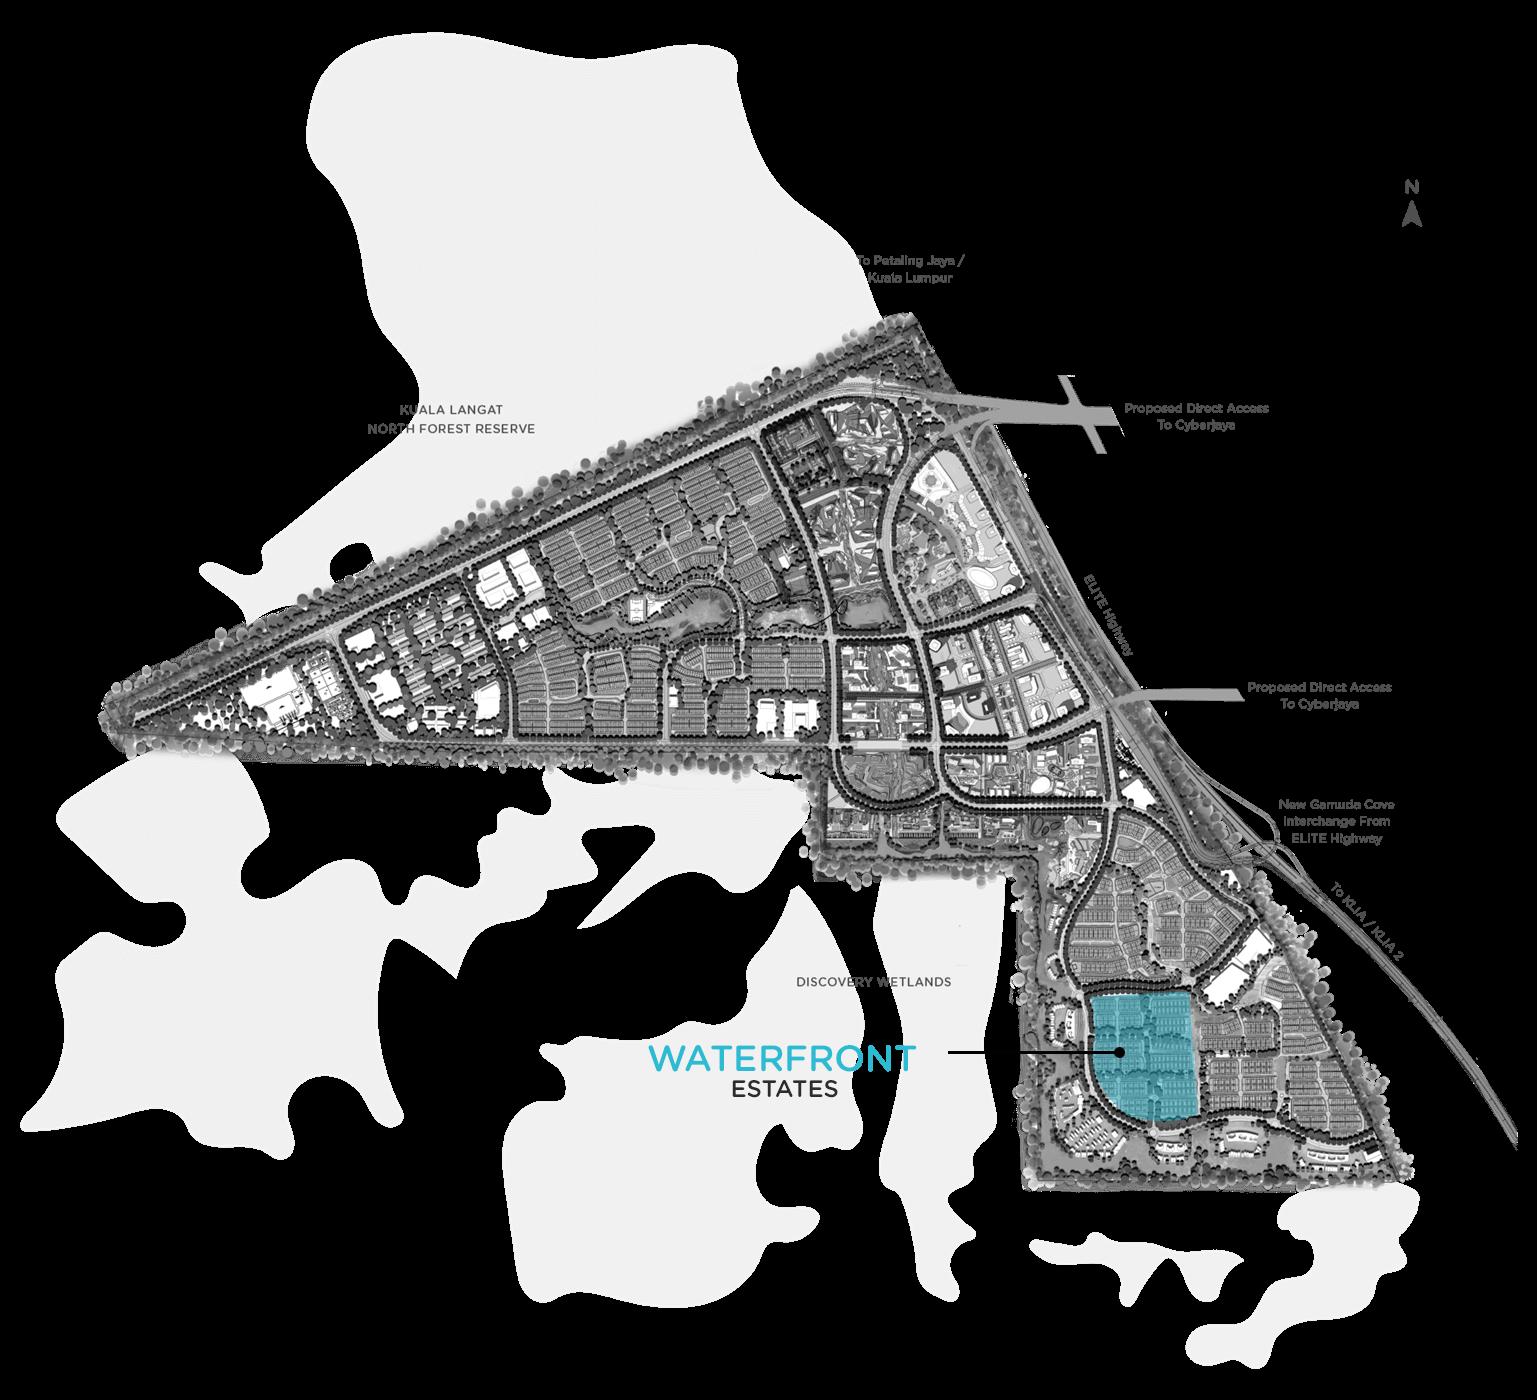 waterfront estates gamuda cove location